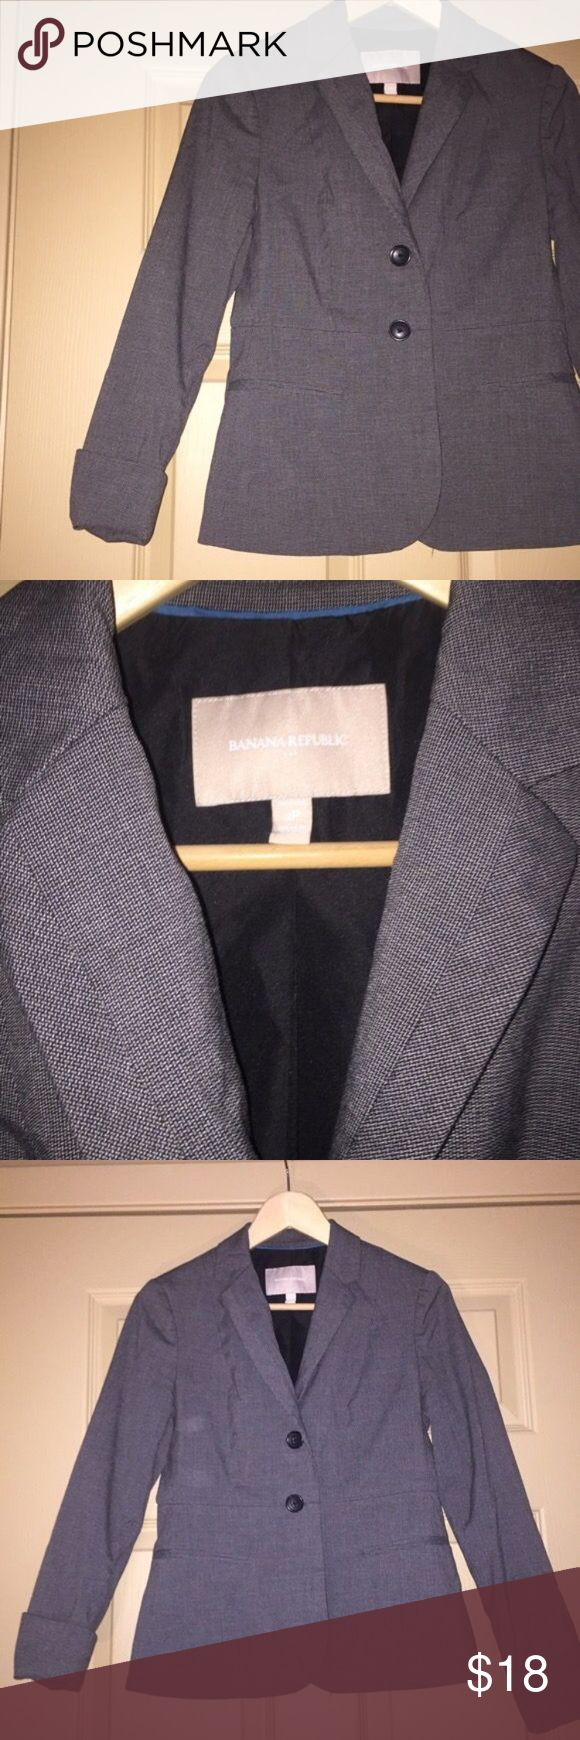 Banana Republic Gray Suit Jacket Size 2 petite Grayish black suit jacket by Banana Republic. Has decorative cuff for rolling. Banana Republic Jackets & Coats Blazers